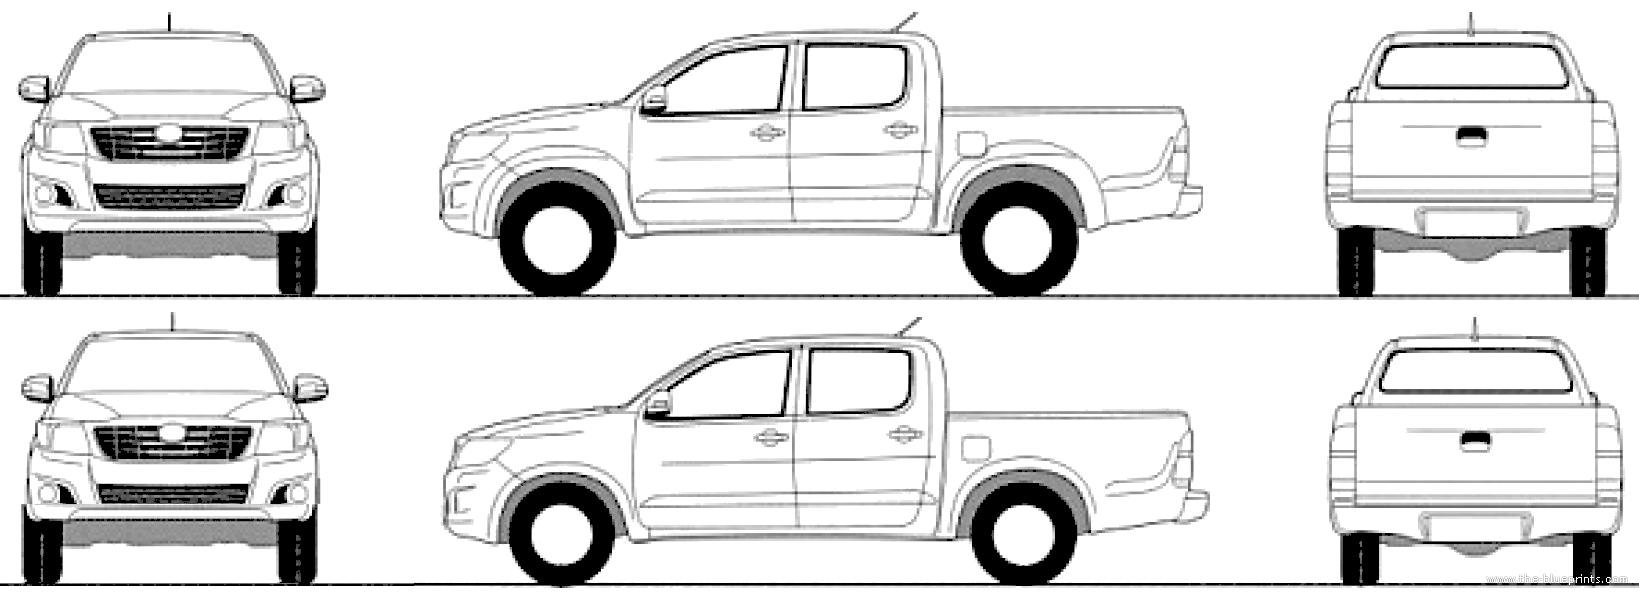 Blueprints > Cars > Toyota > Toyota Hilux (2015)